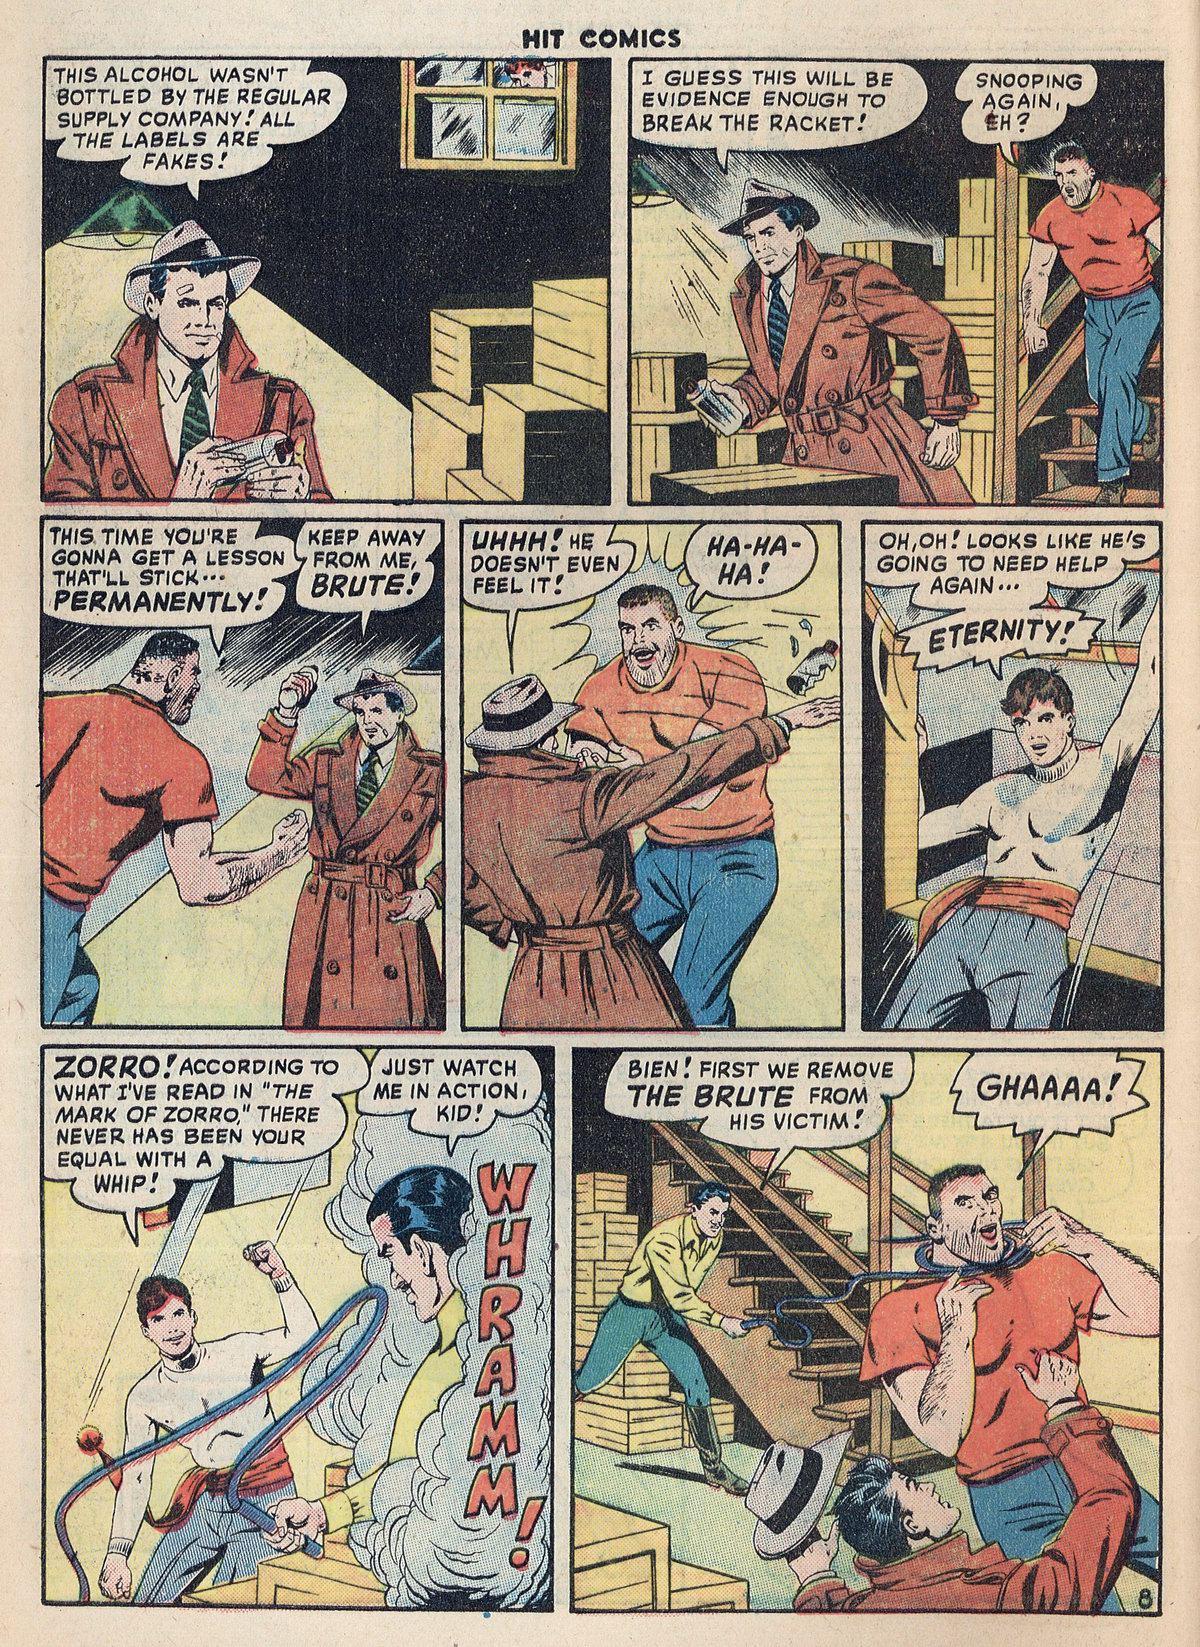 Read online Hit Comics comic -  Issue #55 - 10